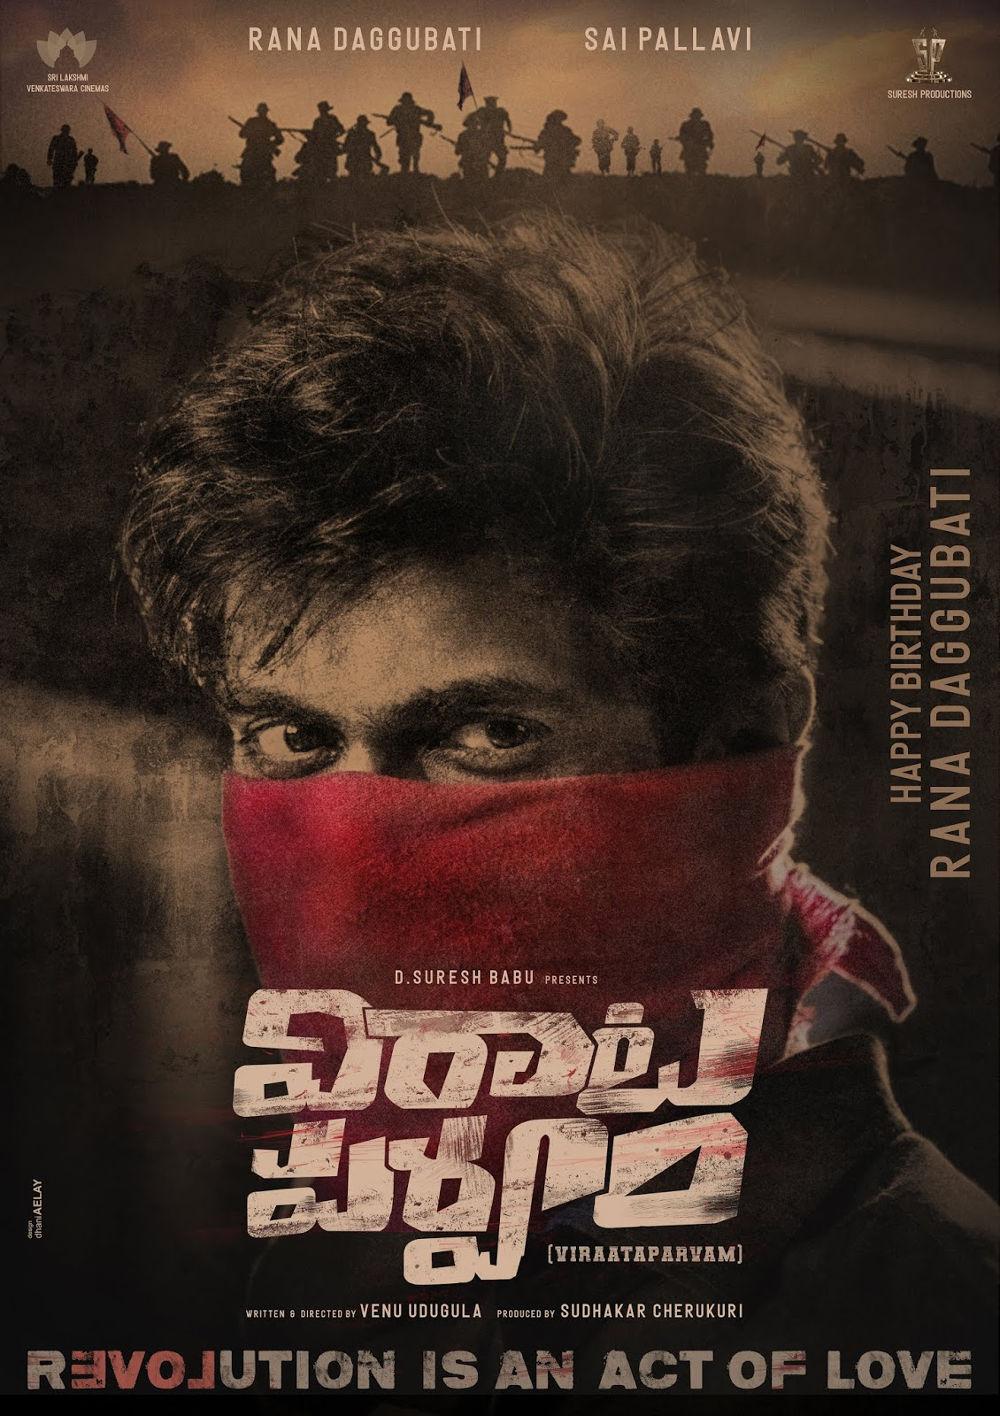 Rana Sai Pallavi Virataparvam Movie Shooting Resumes